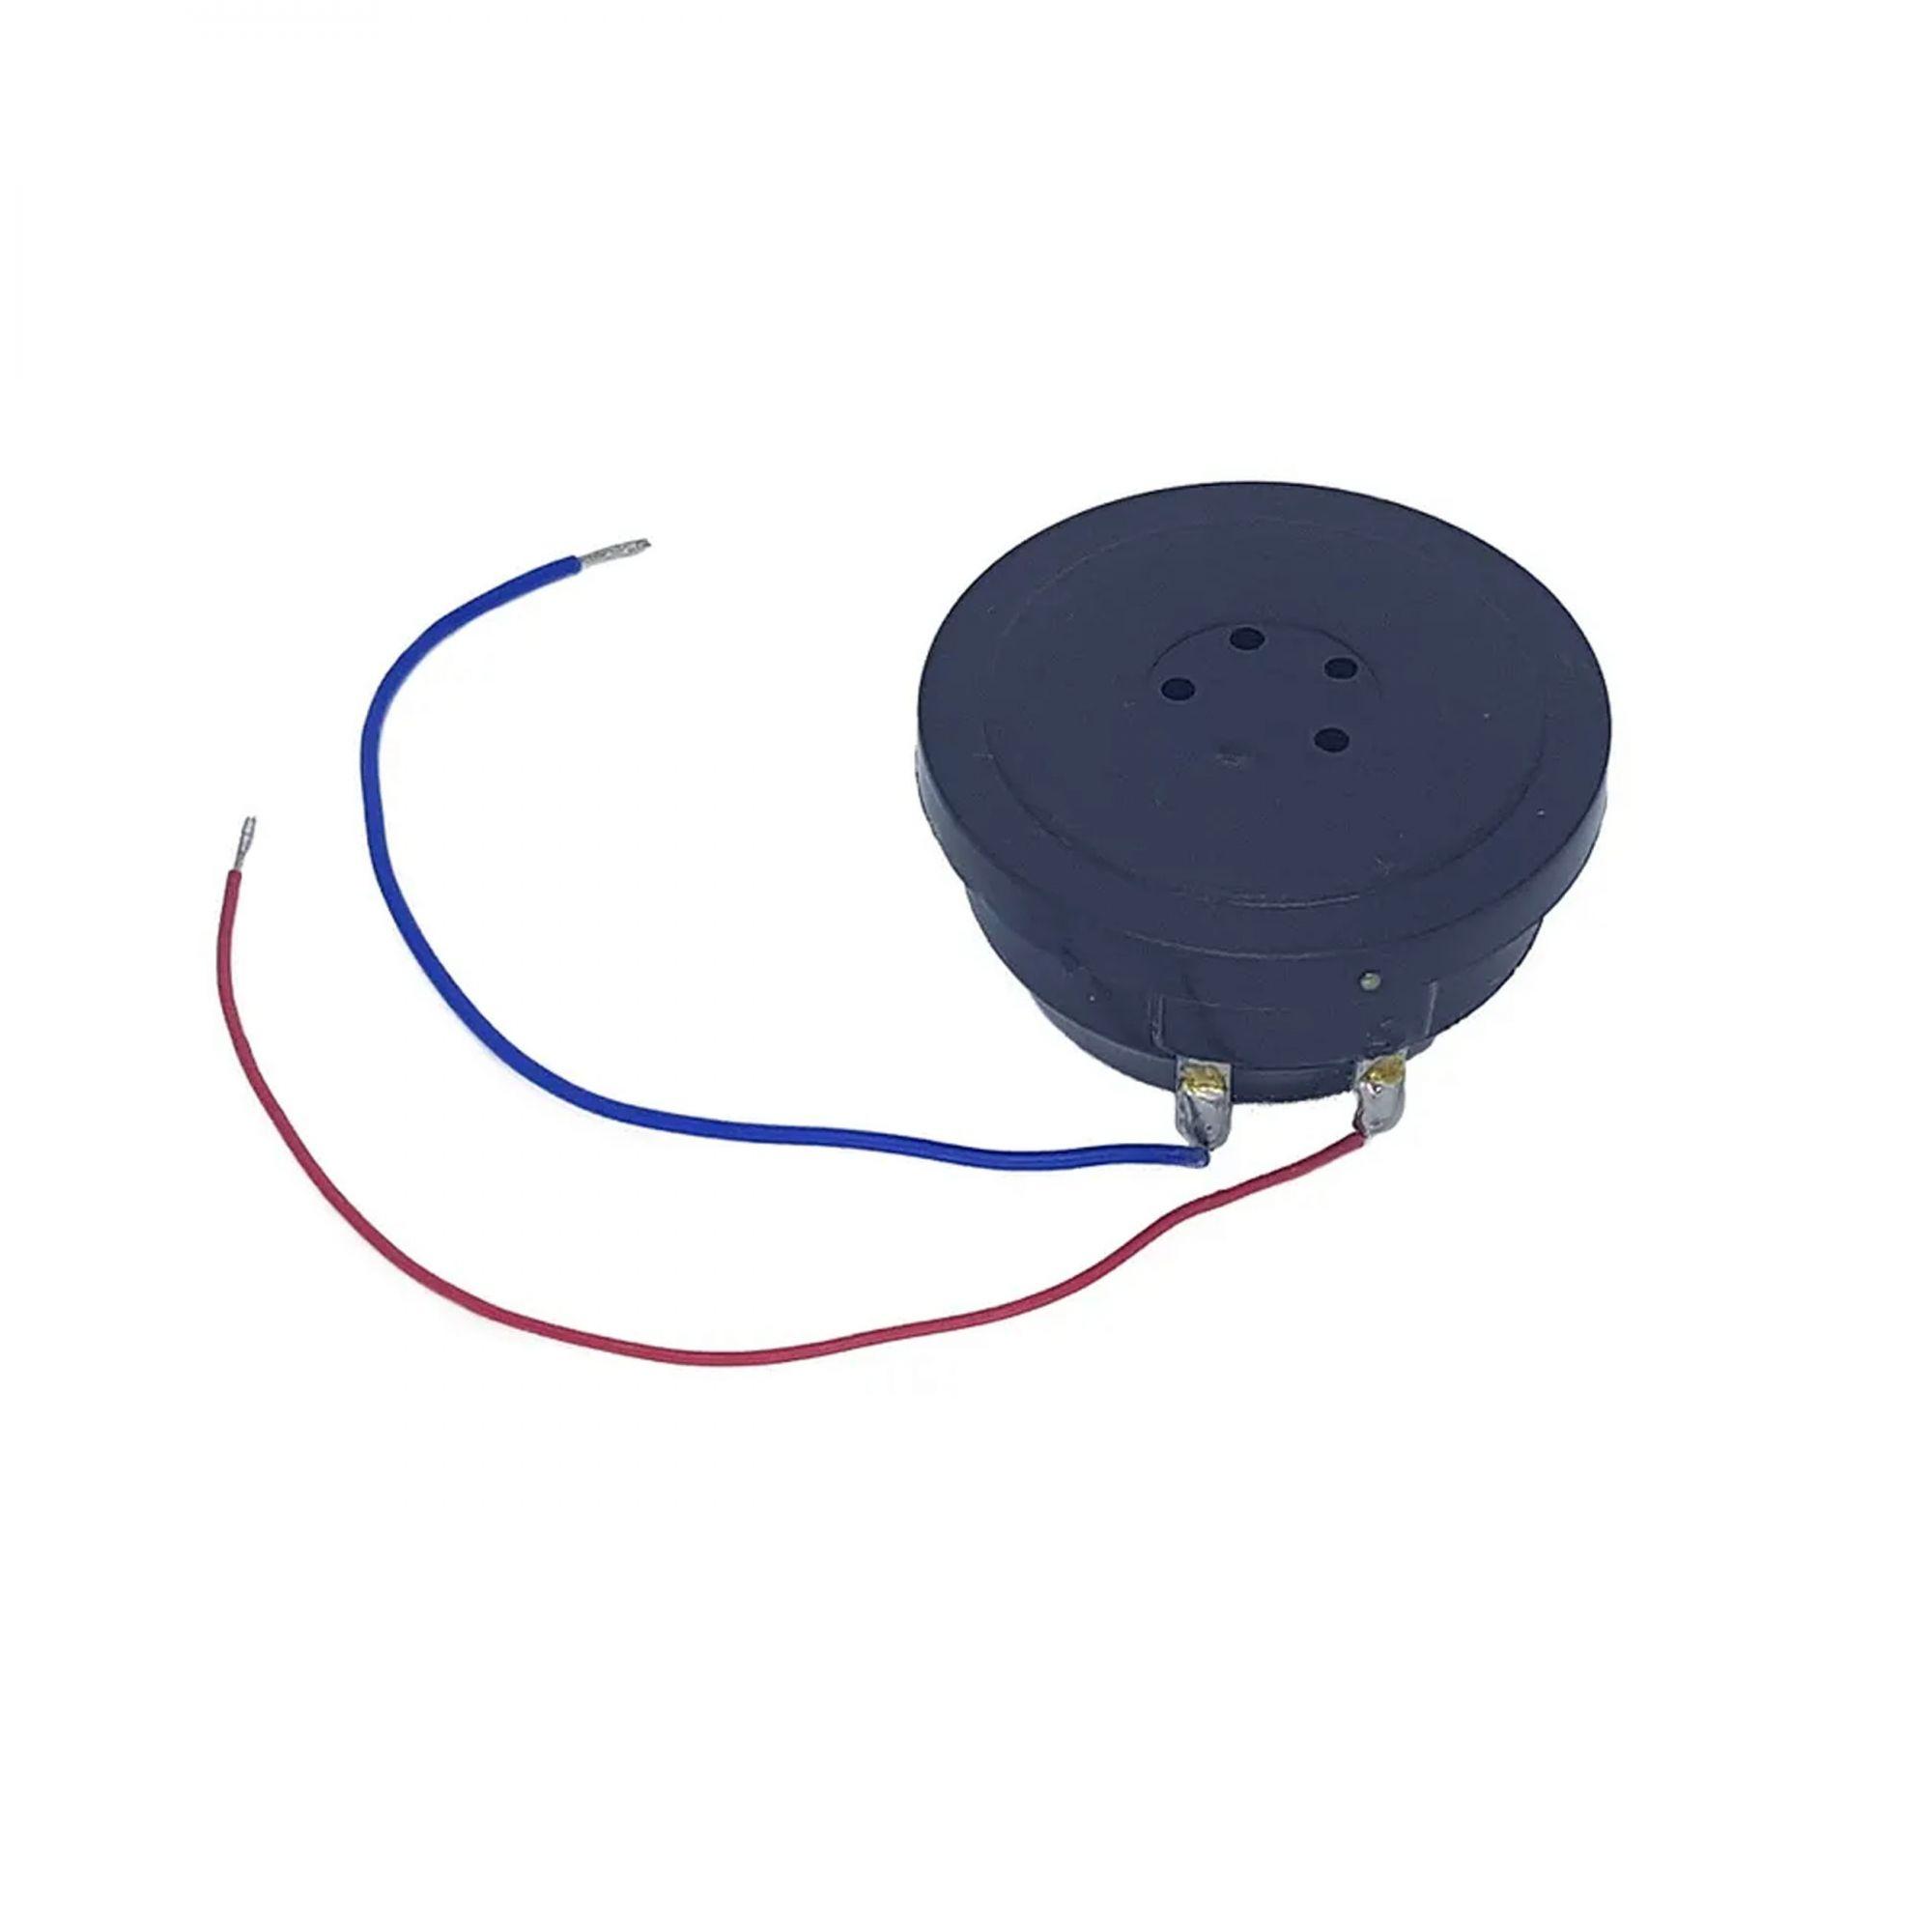 Capsula Dinamica 300 omhs Microfone PTT - RV4364